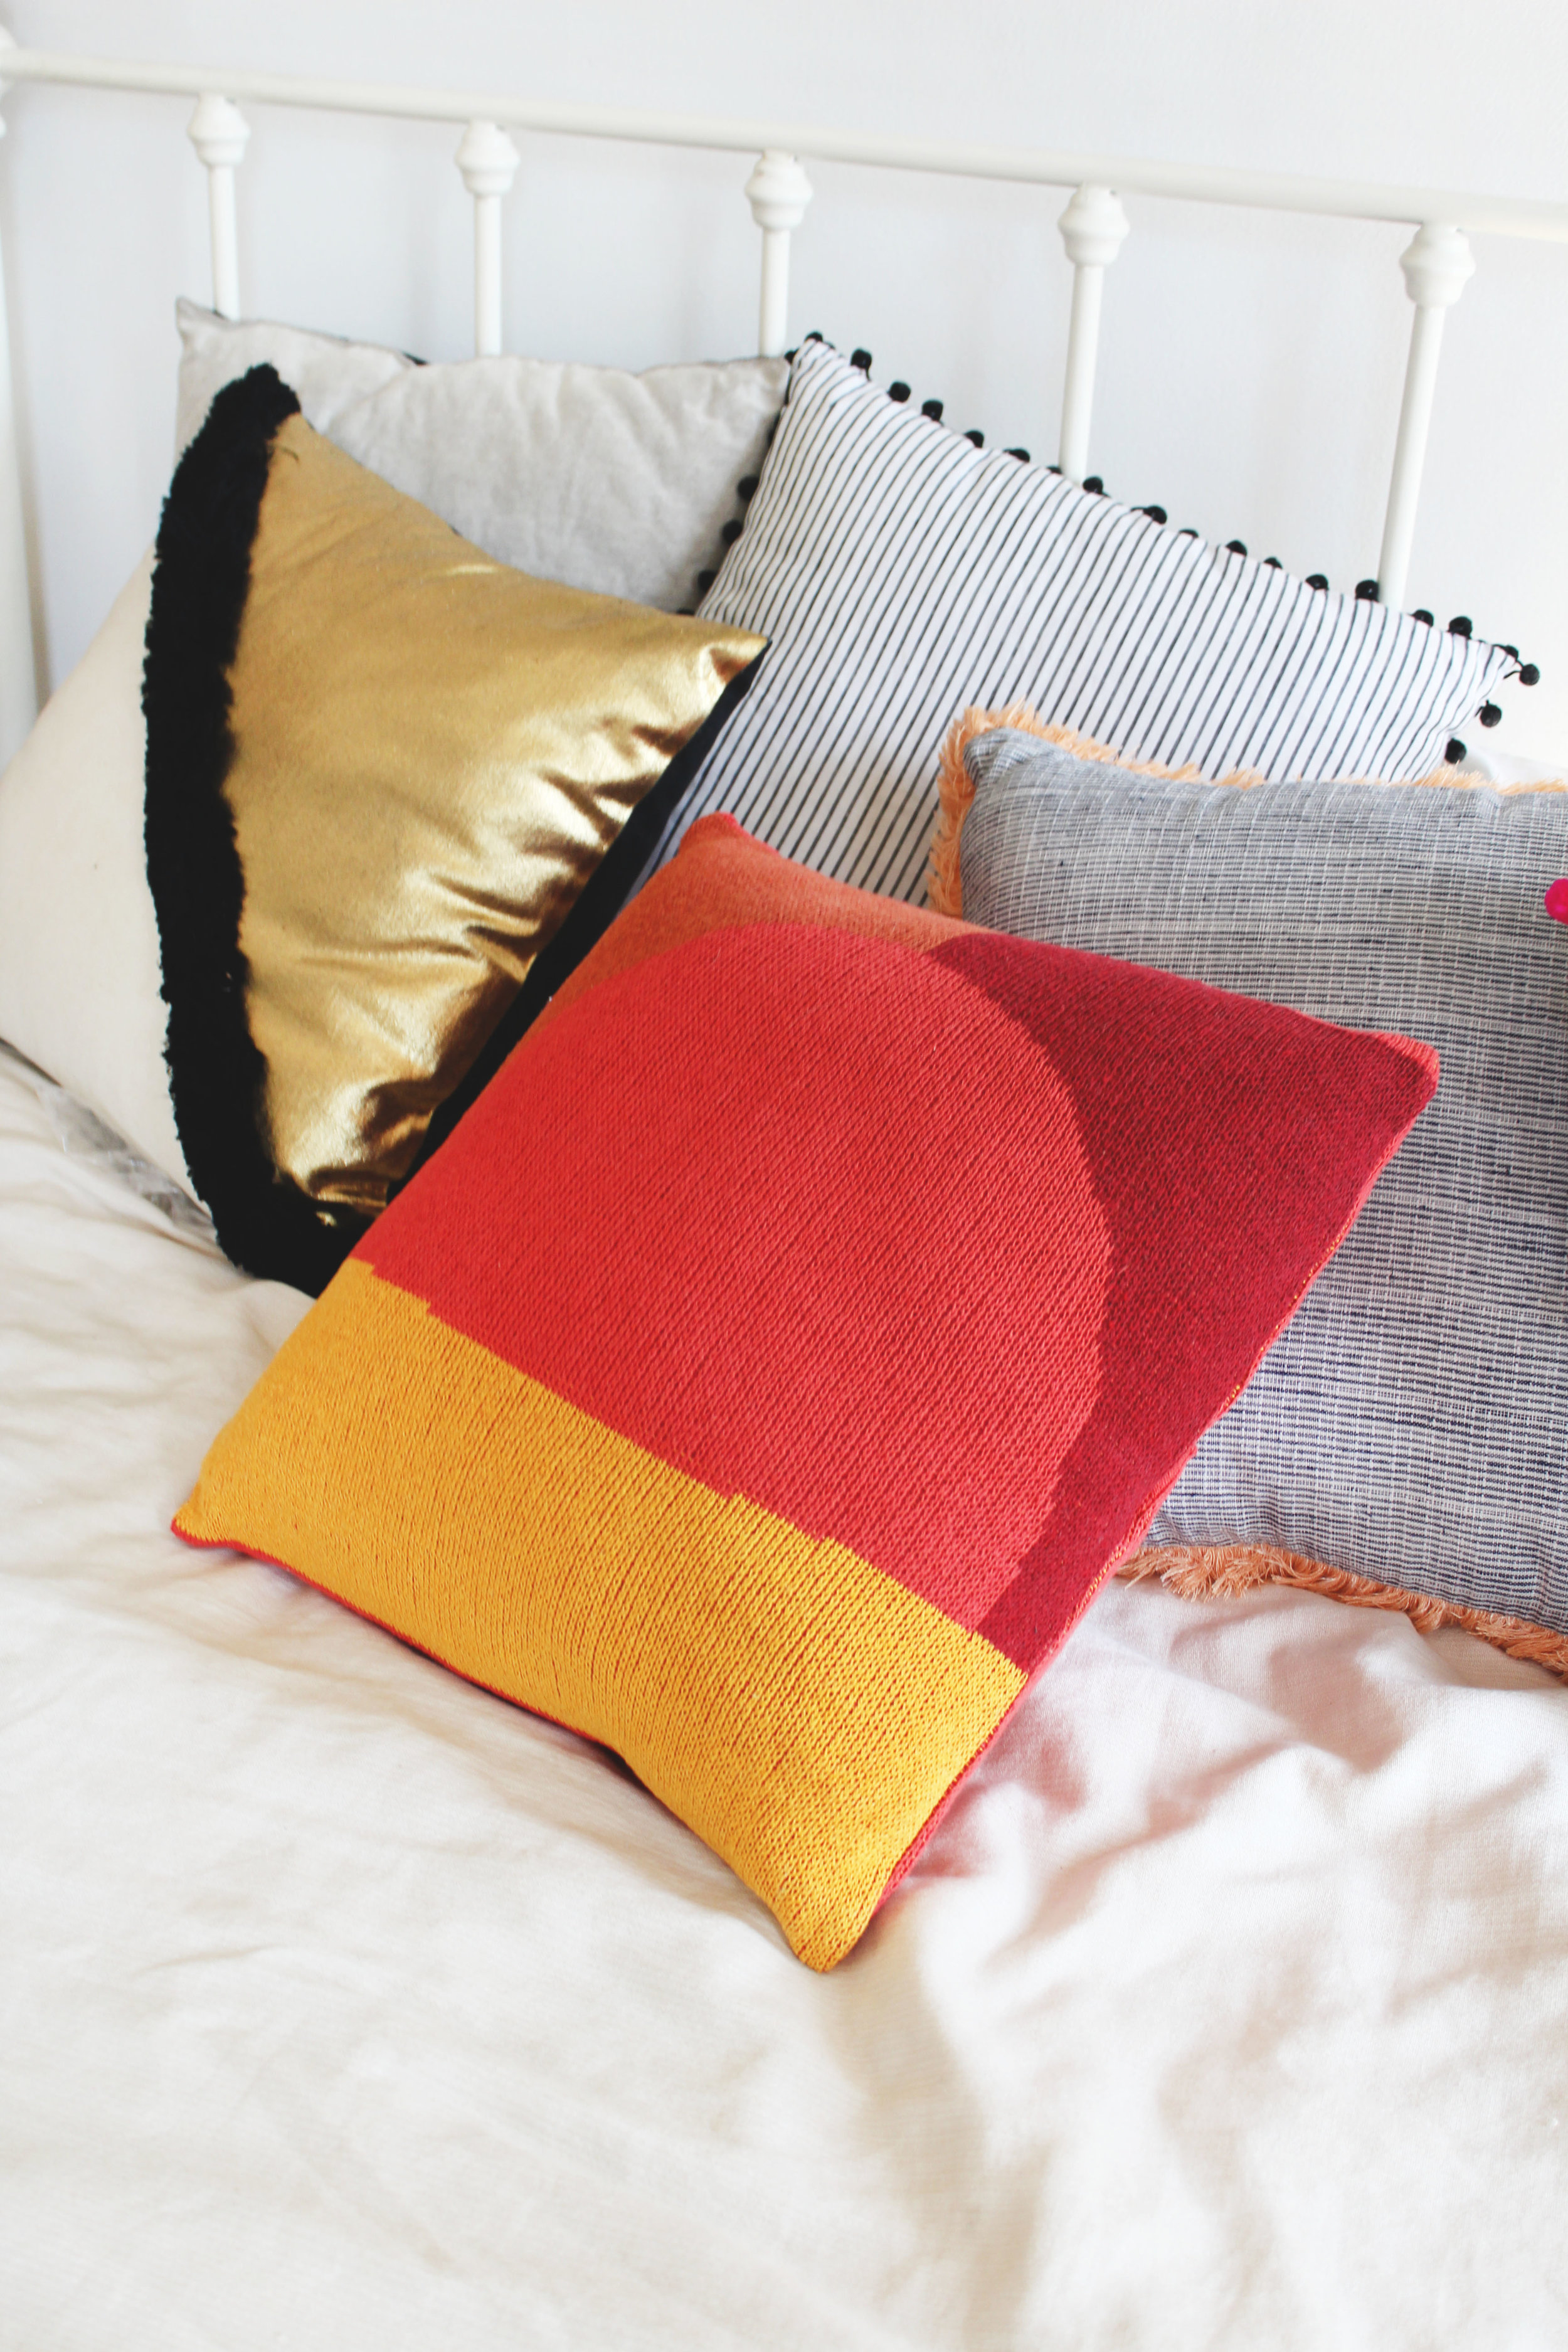 Sunrise knit Pillow by Calhoun & CO.